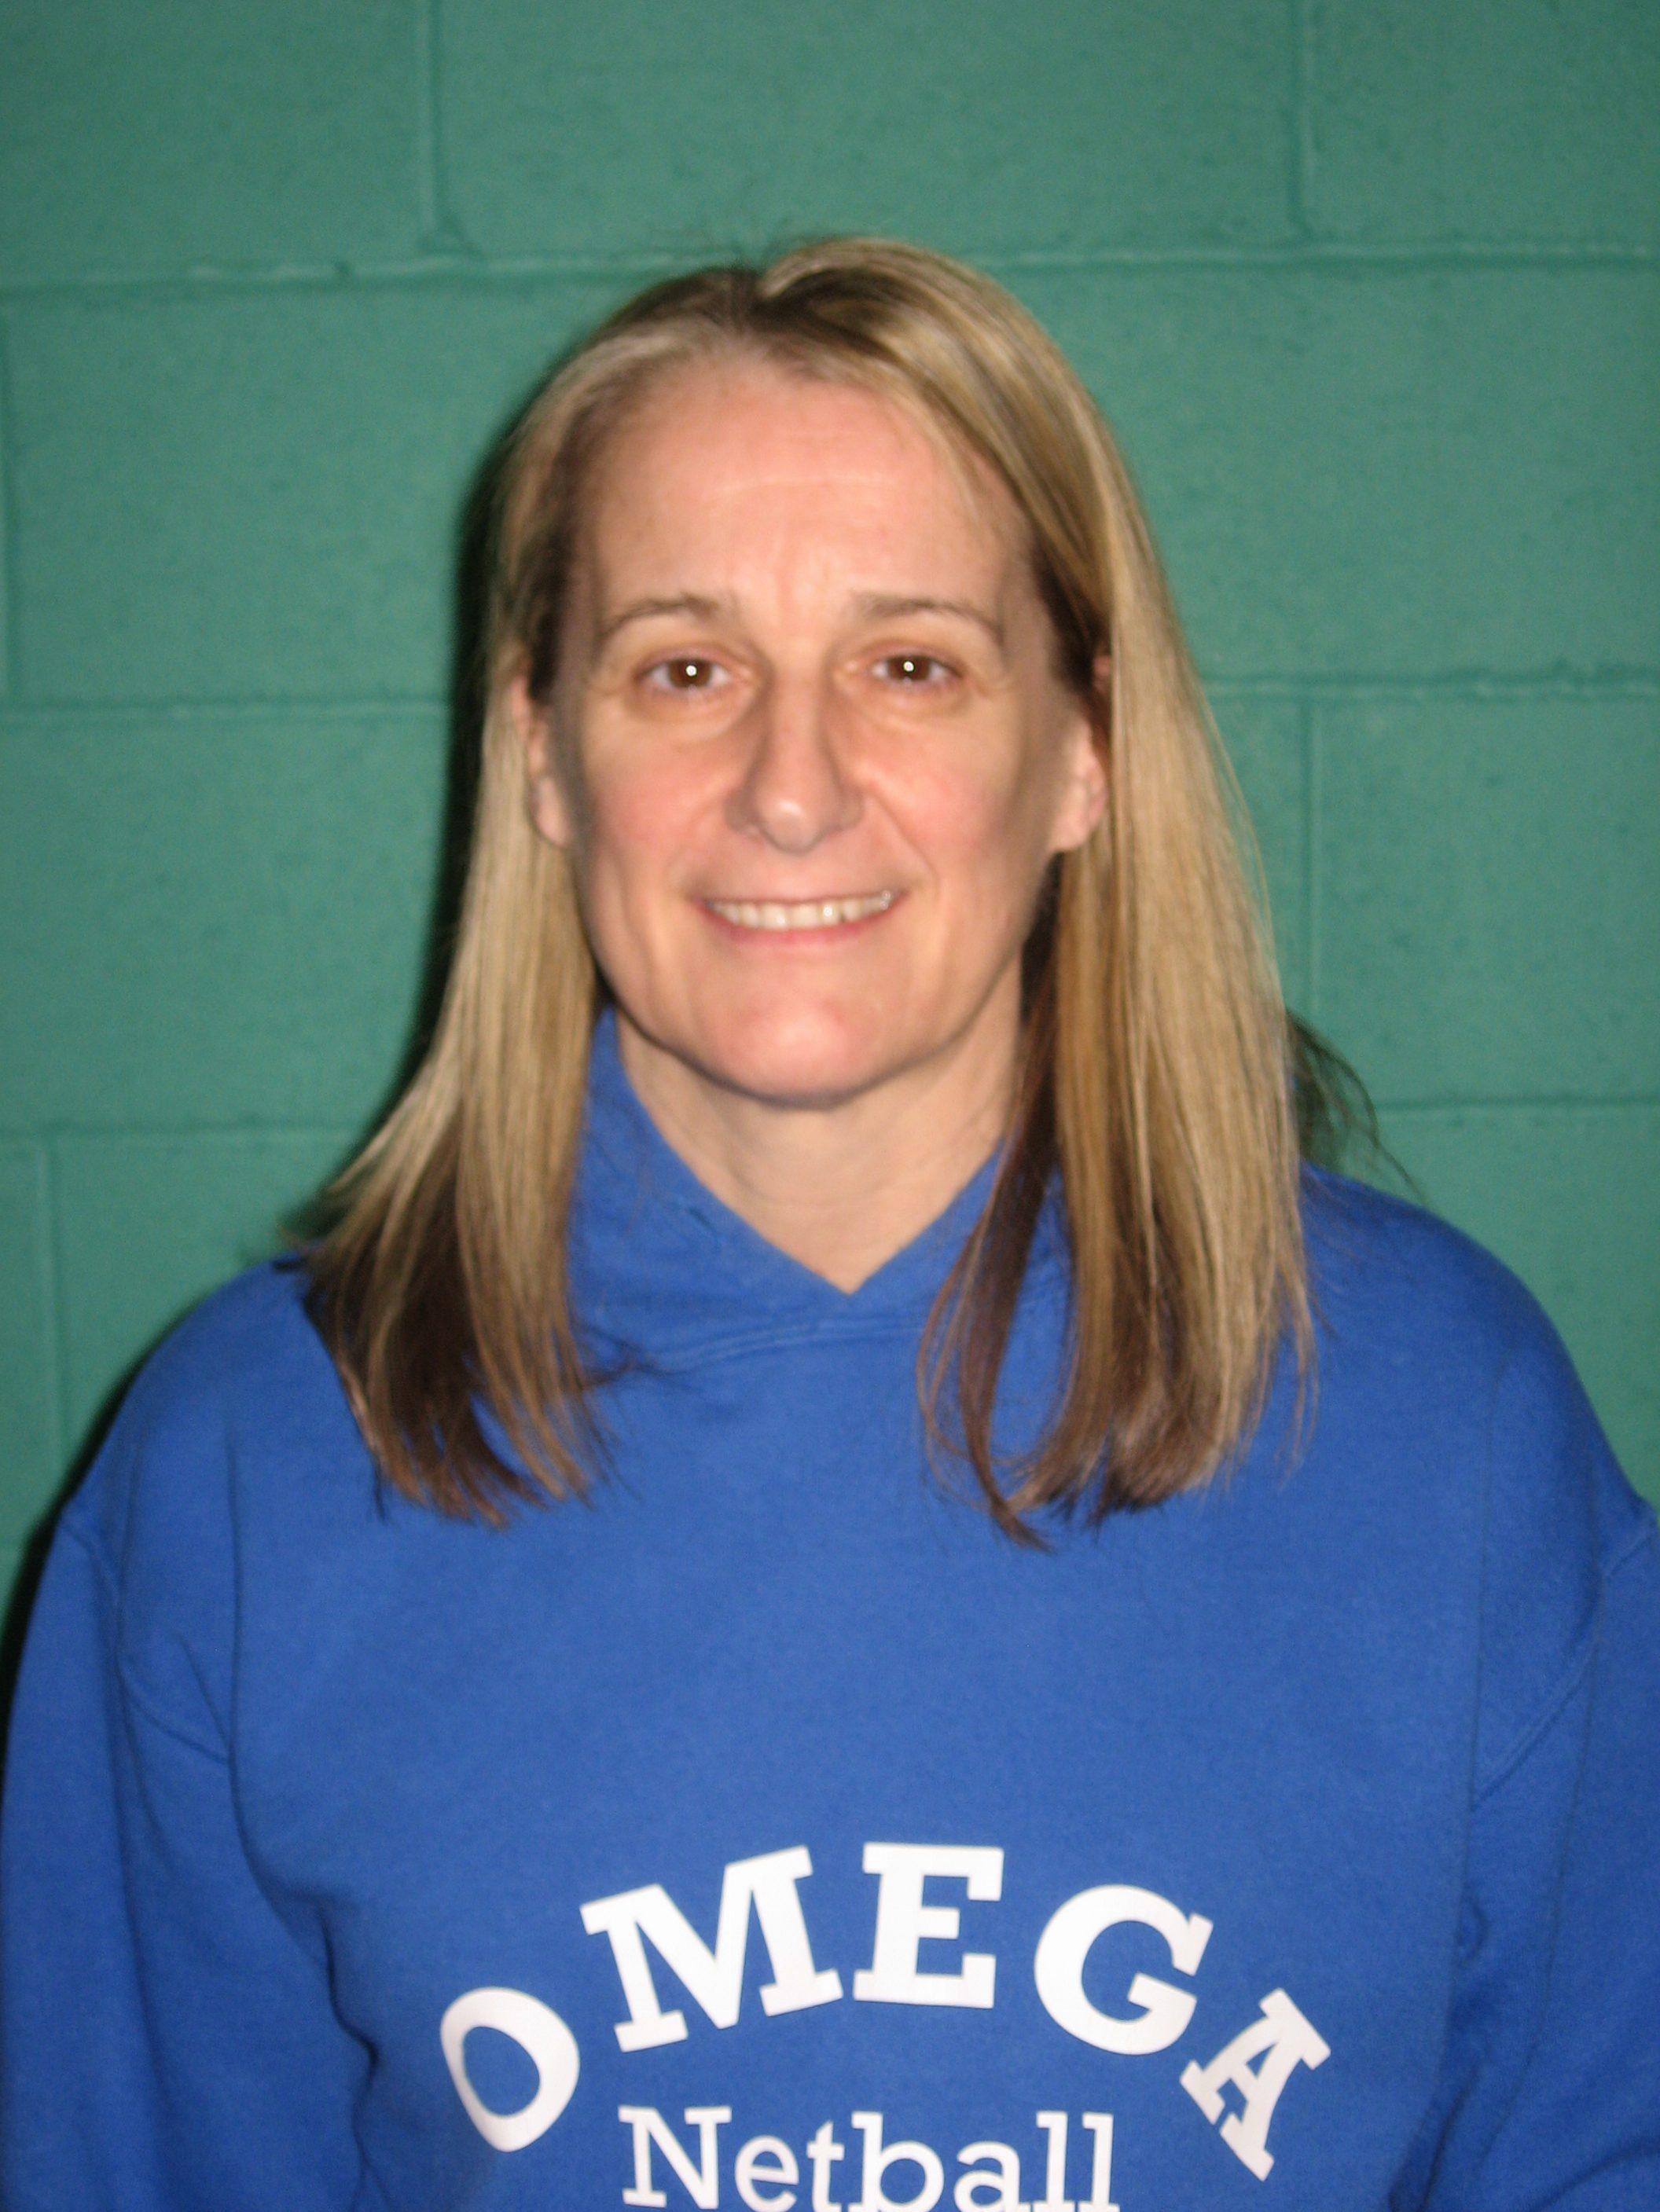 Andrea - Coach